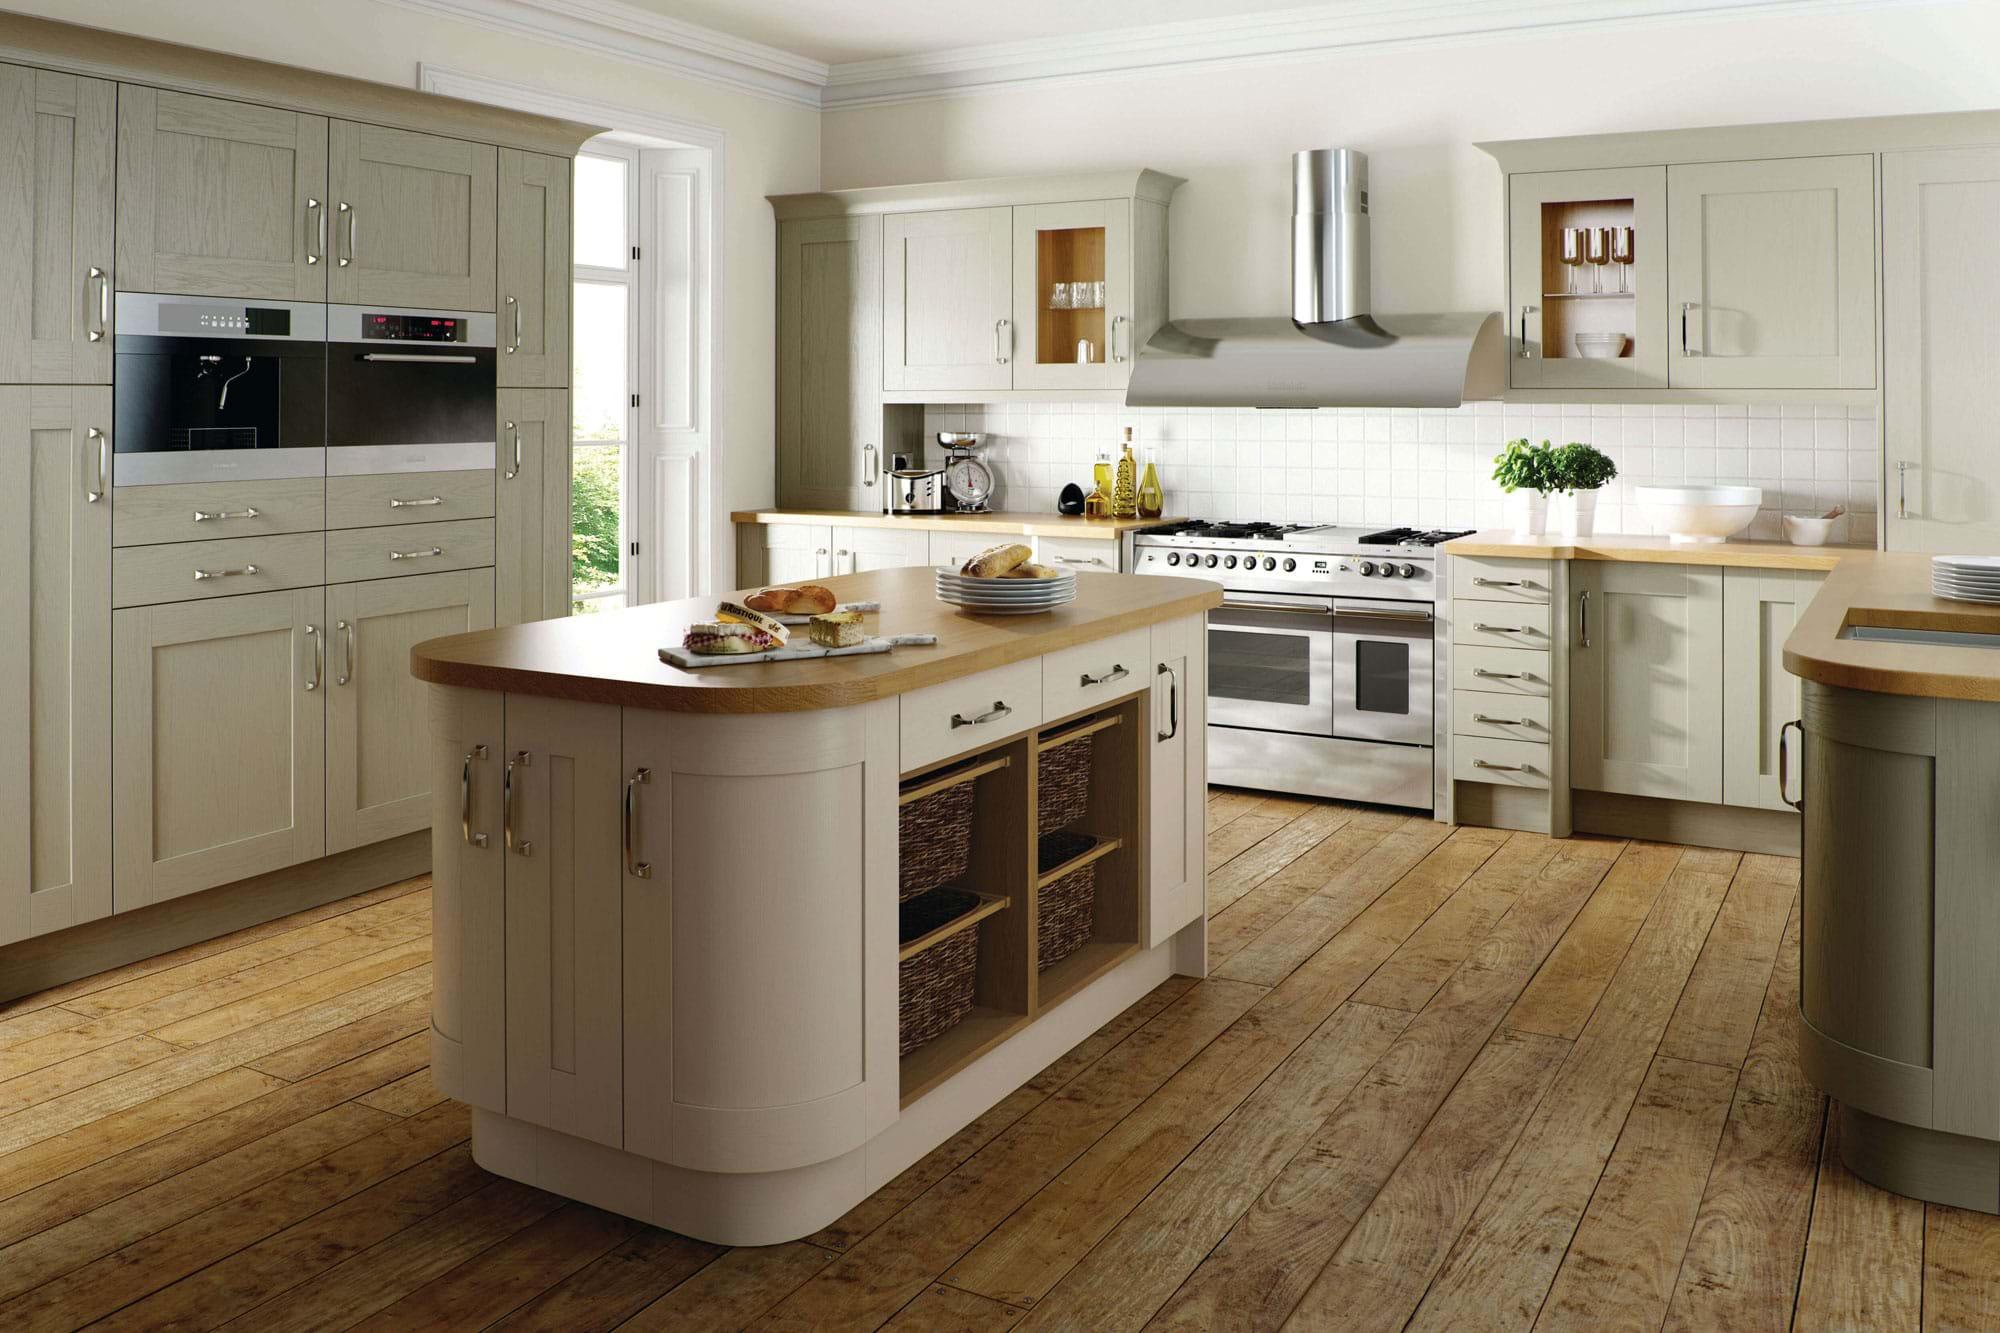 Shaker Leekes Kitchens